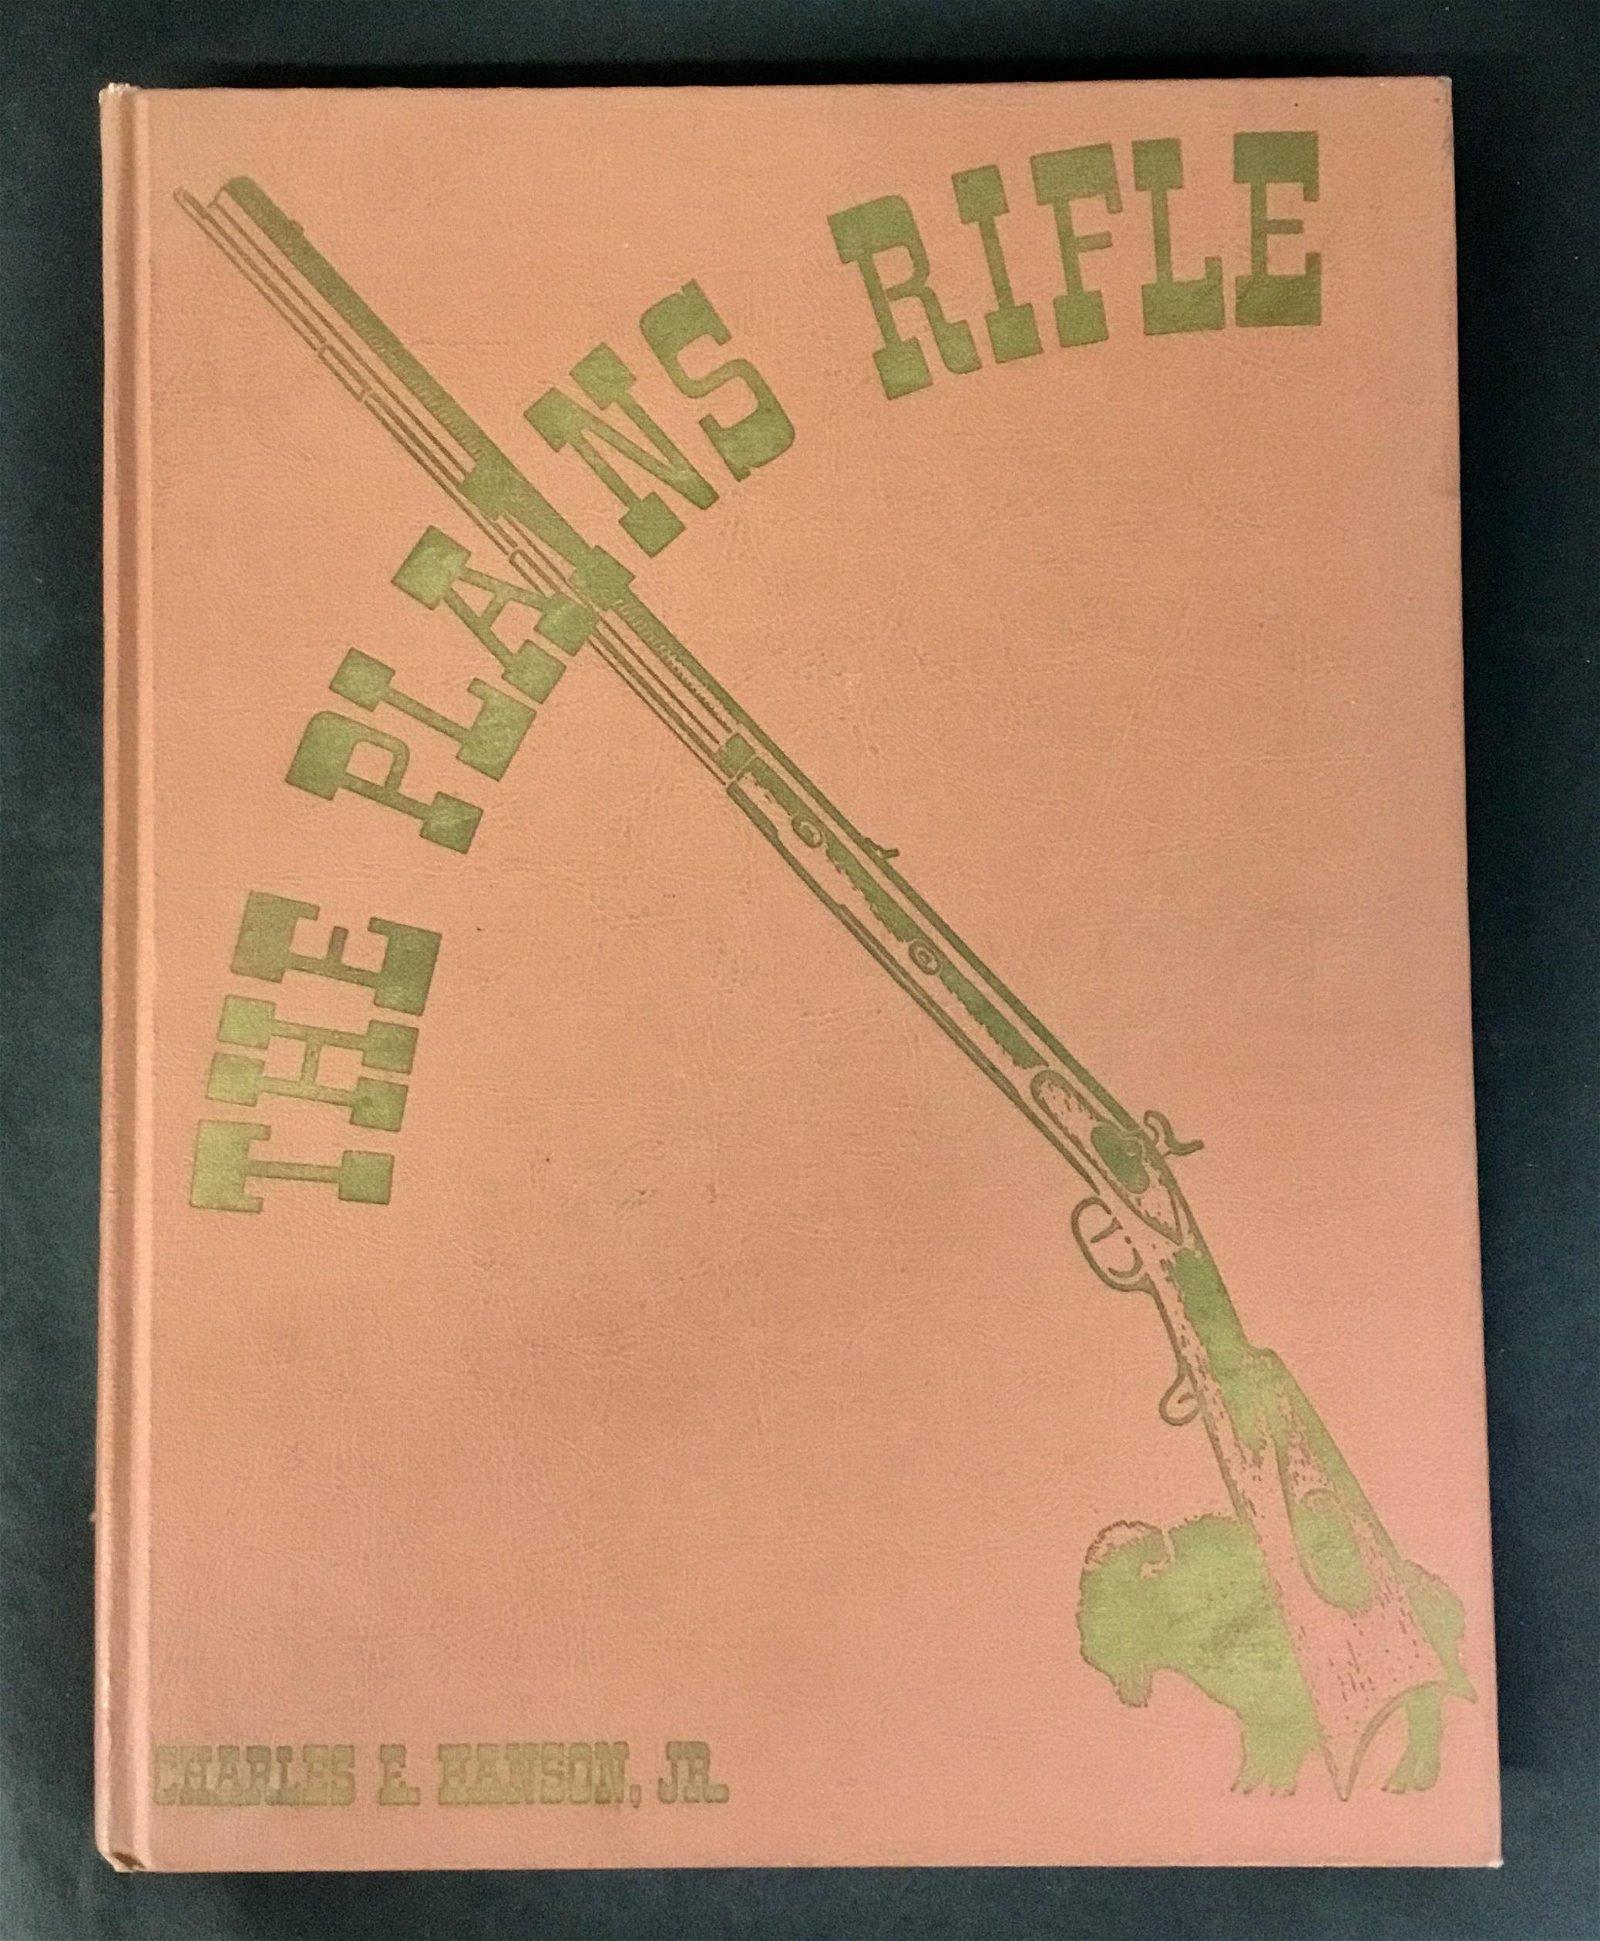 The Plains Rifle by Charles Hanson 1960